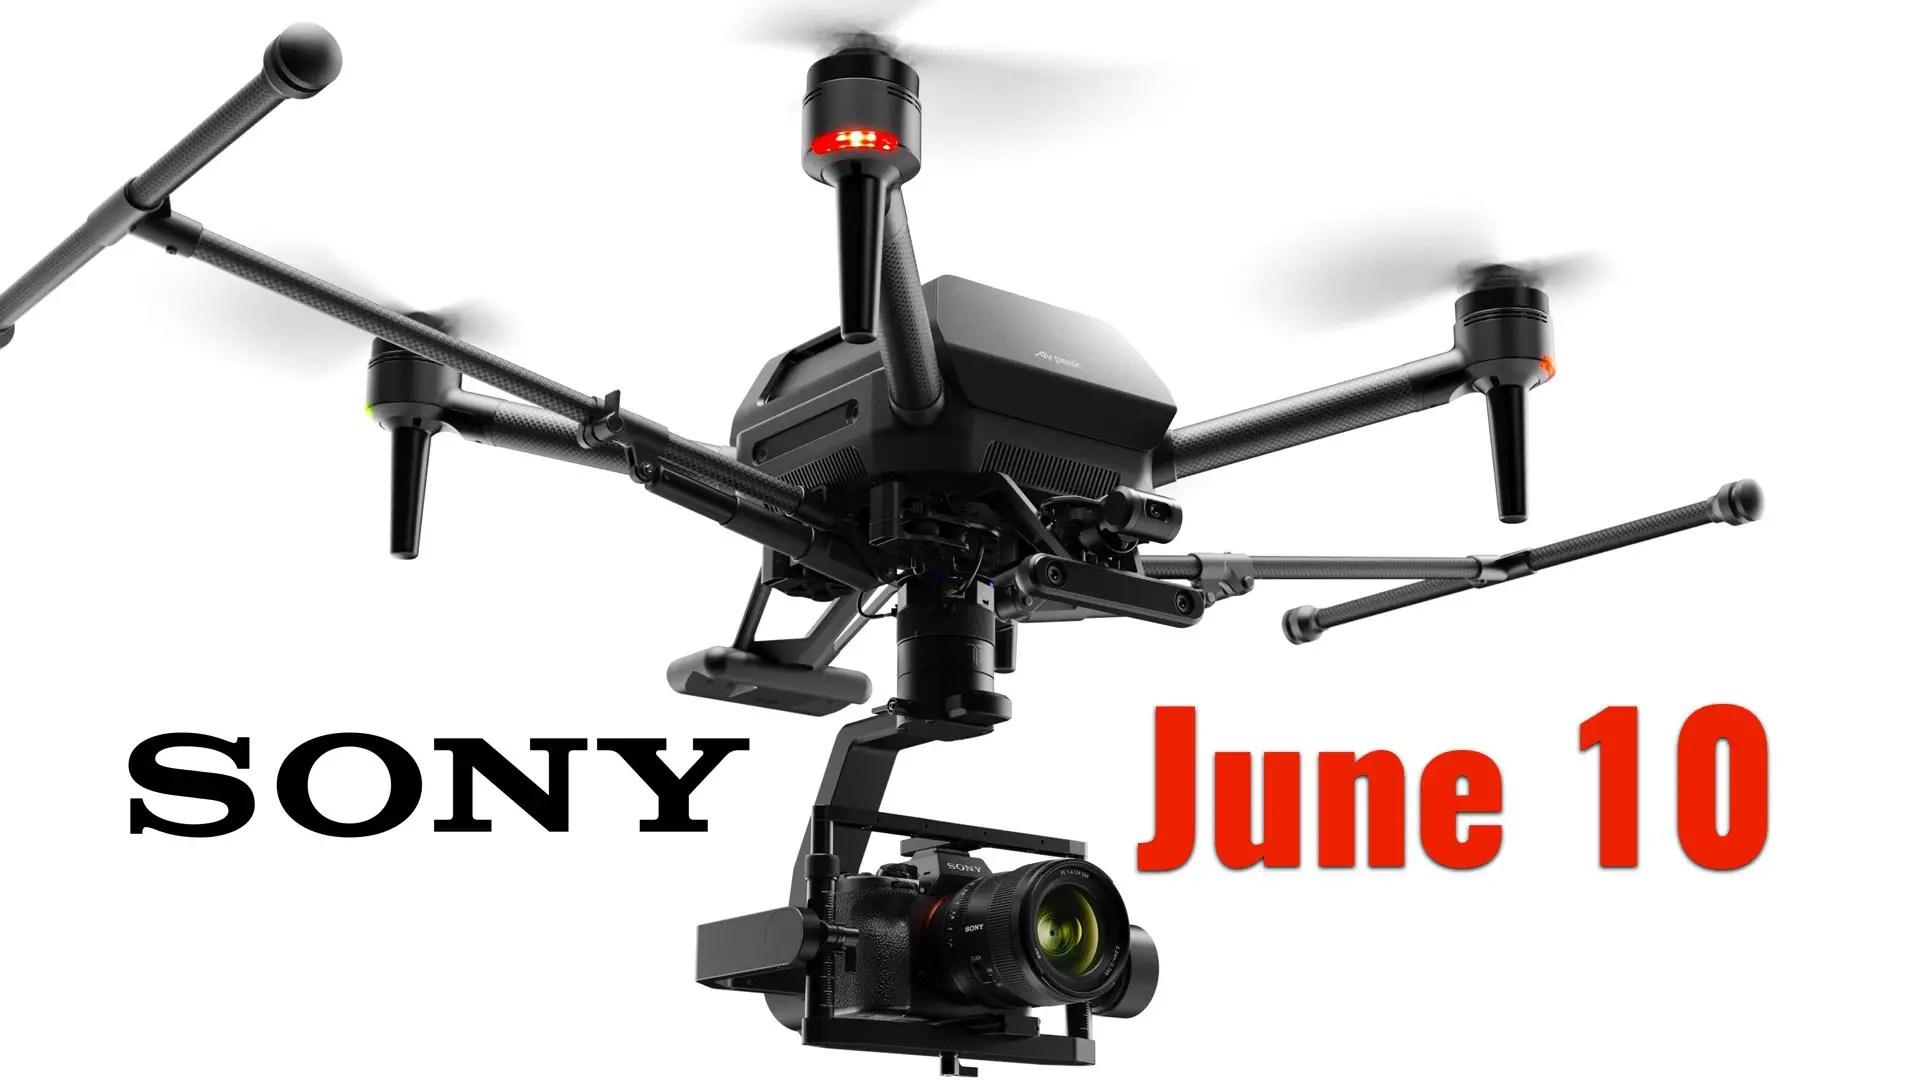 Sony Says Airpeak is Coming on June 10